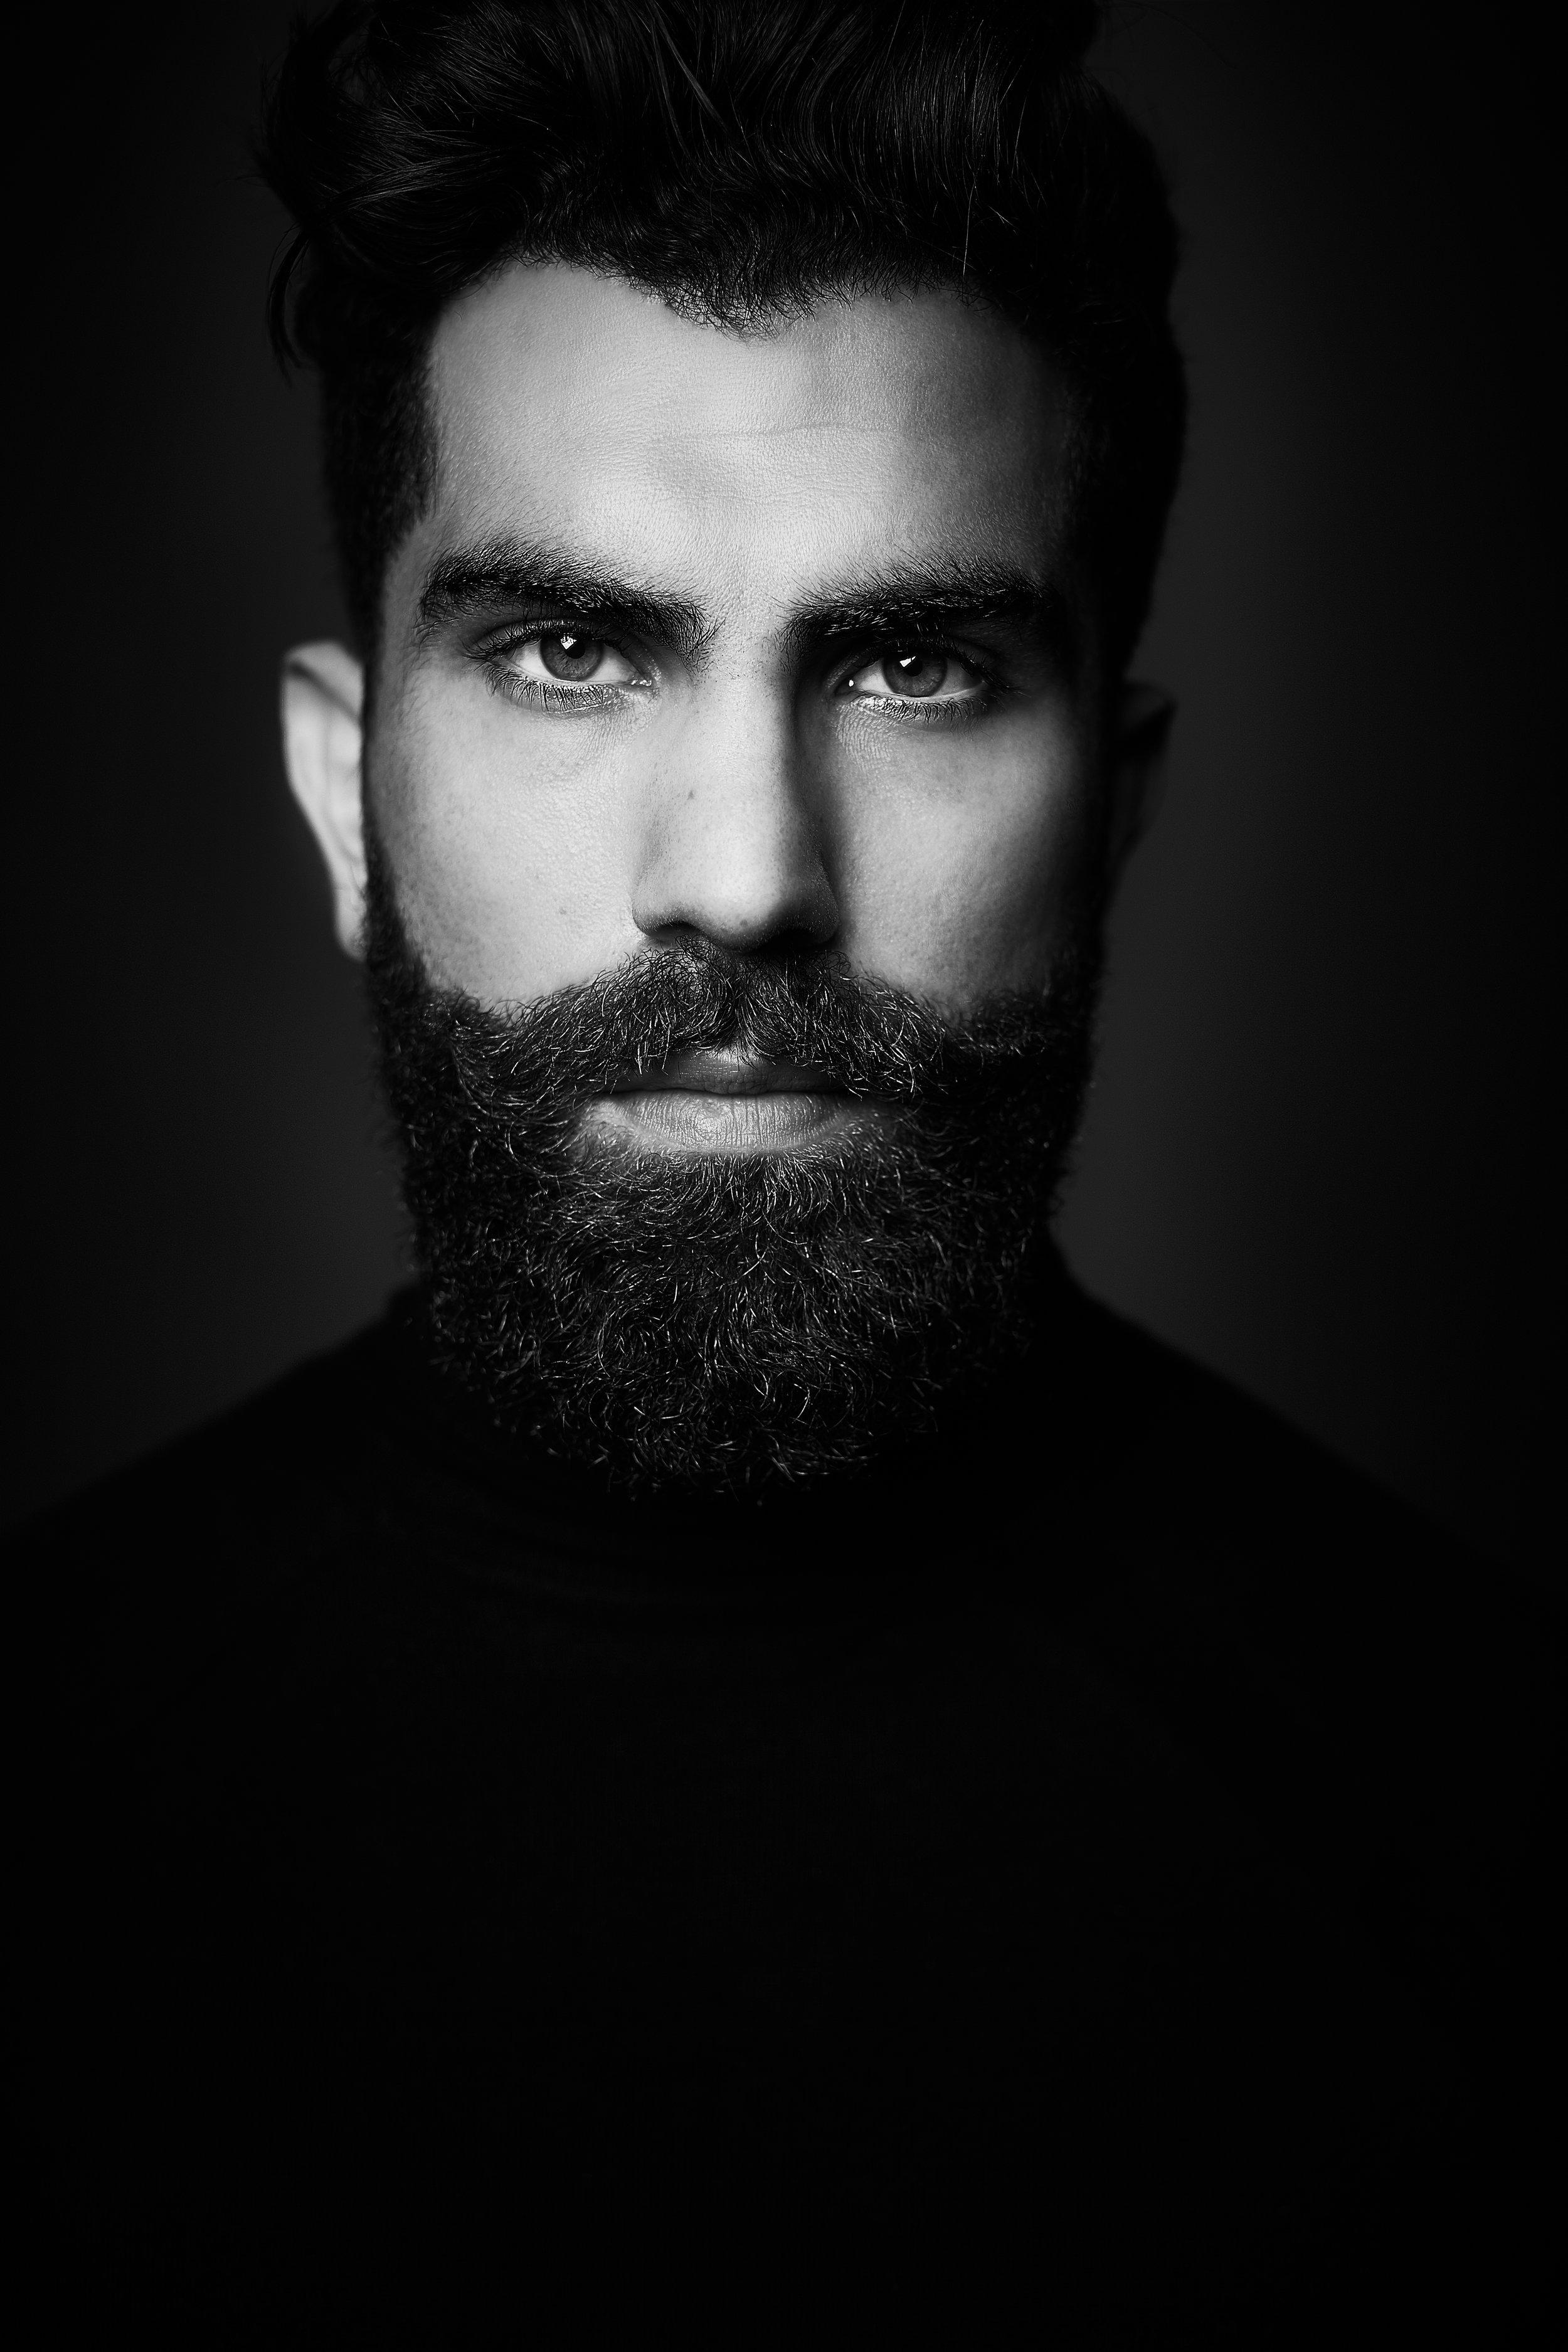 Portrait_063_Reza_Jackson_10401.jpg